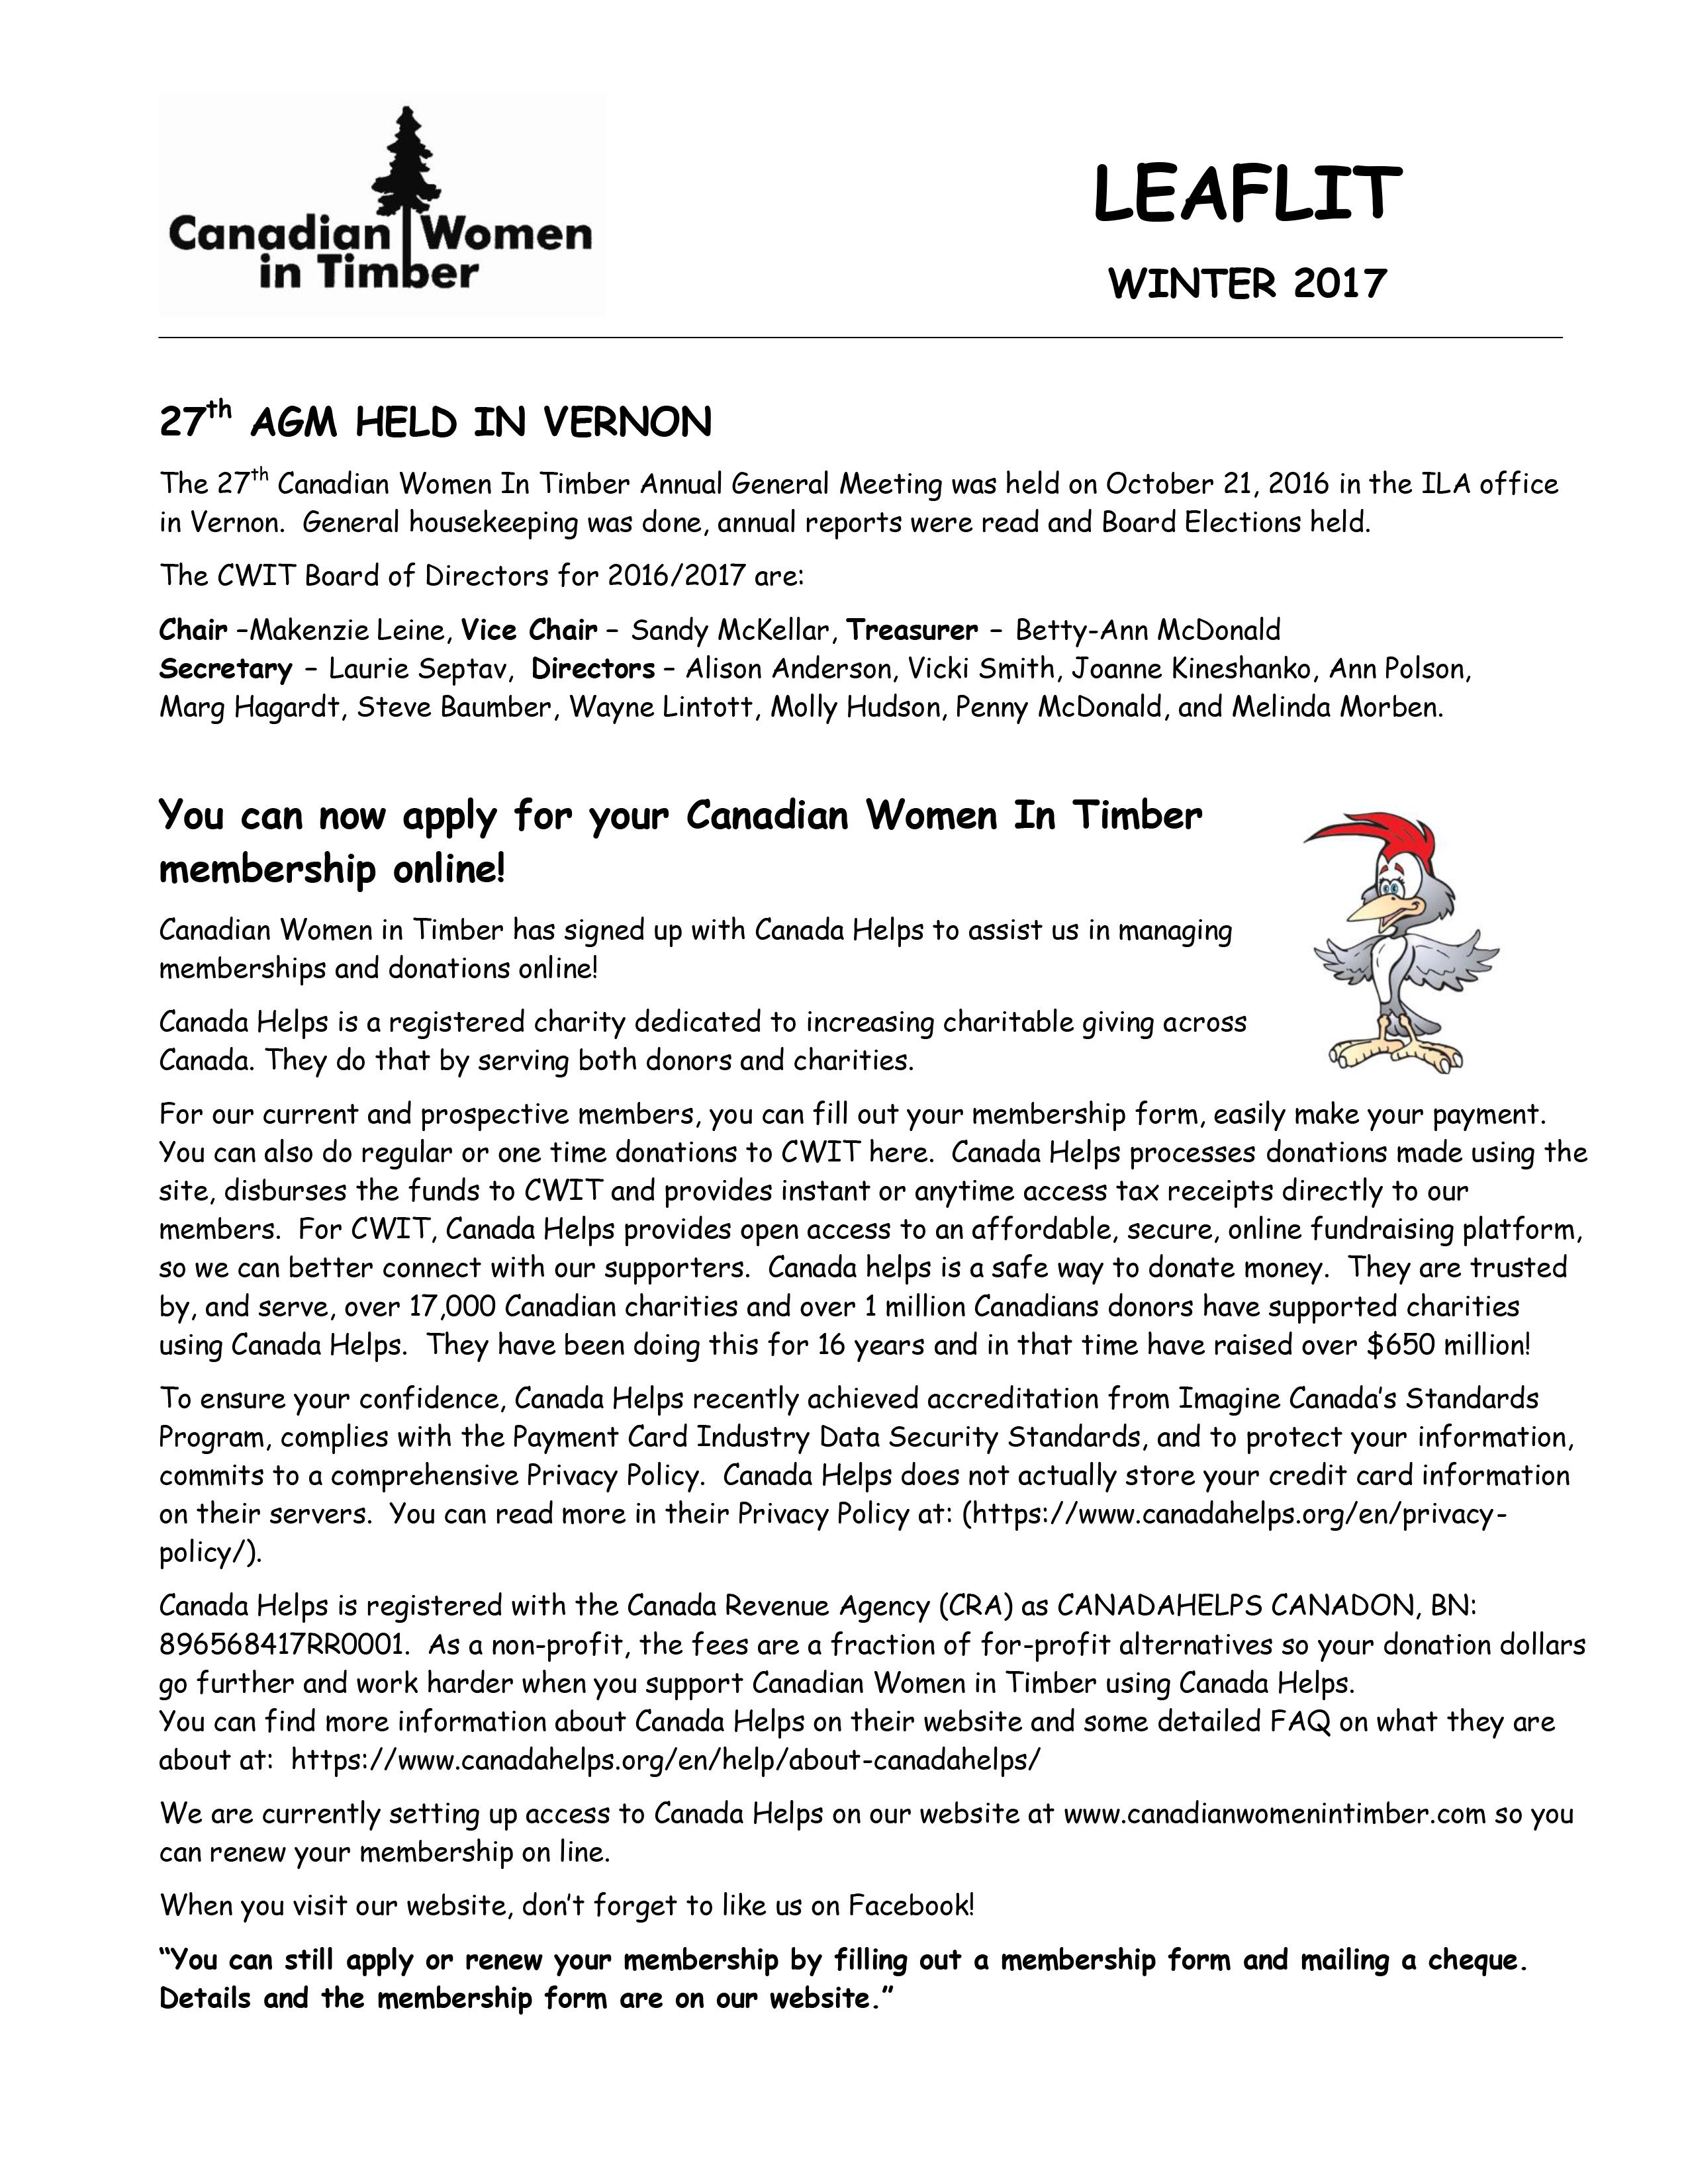 2017 Winter Leaflit